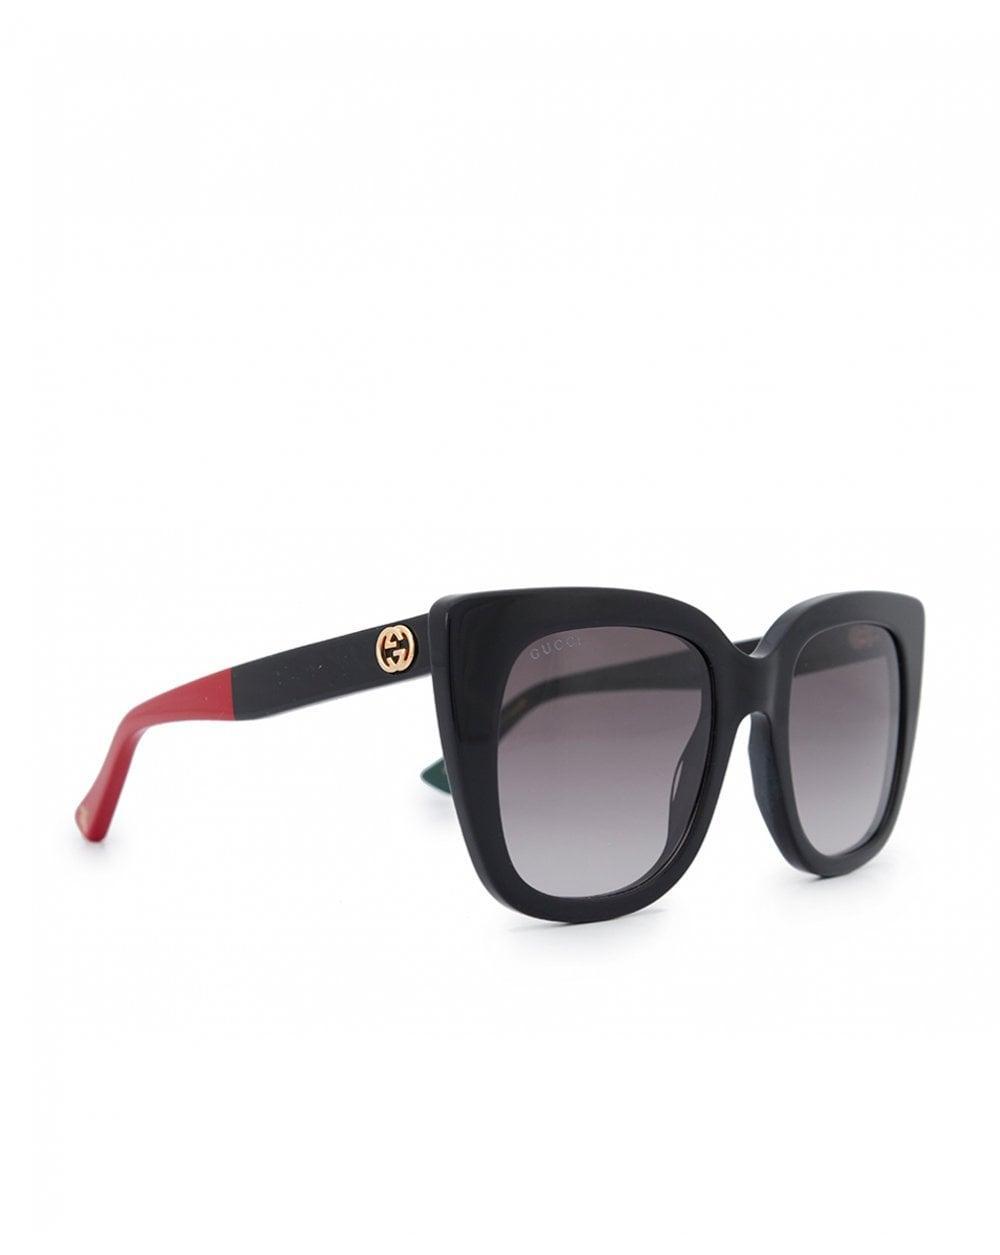 ceae47eacfb23 Lyst - Gucci Gucci Socks Plastic Sunglasses in Black